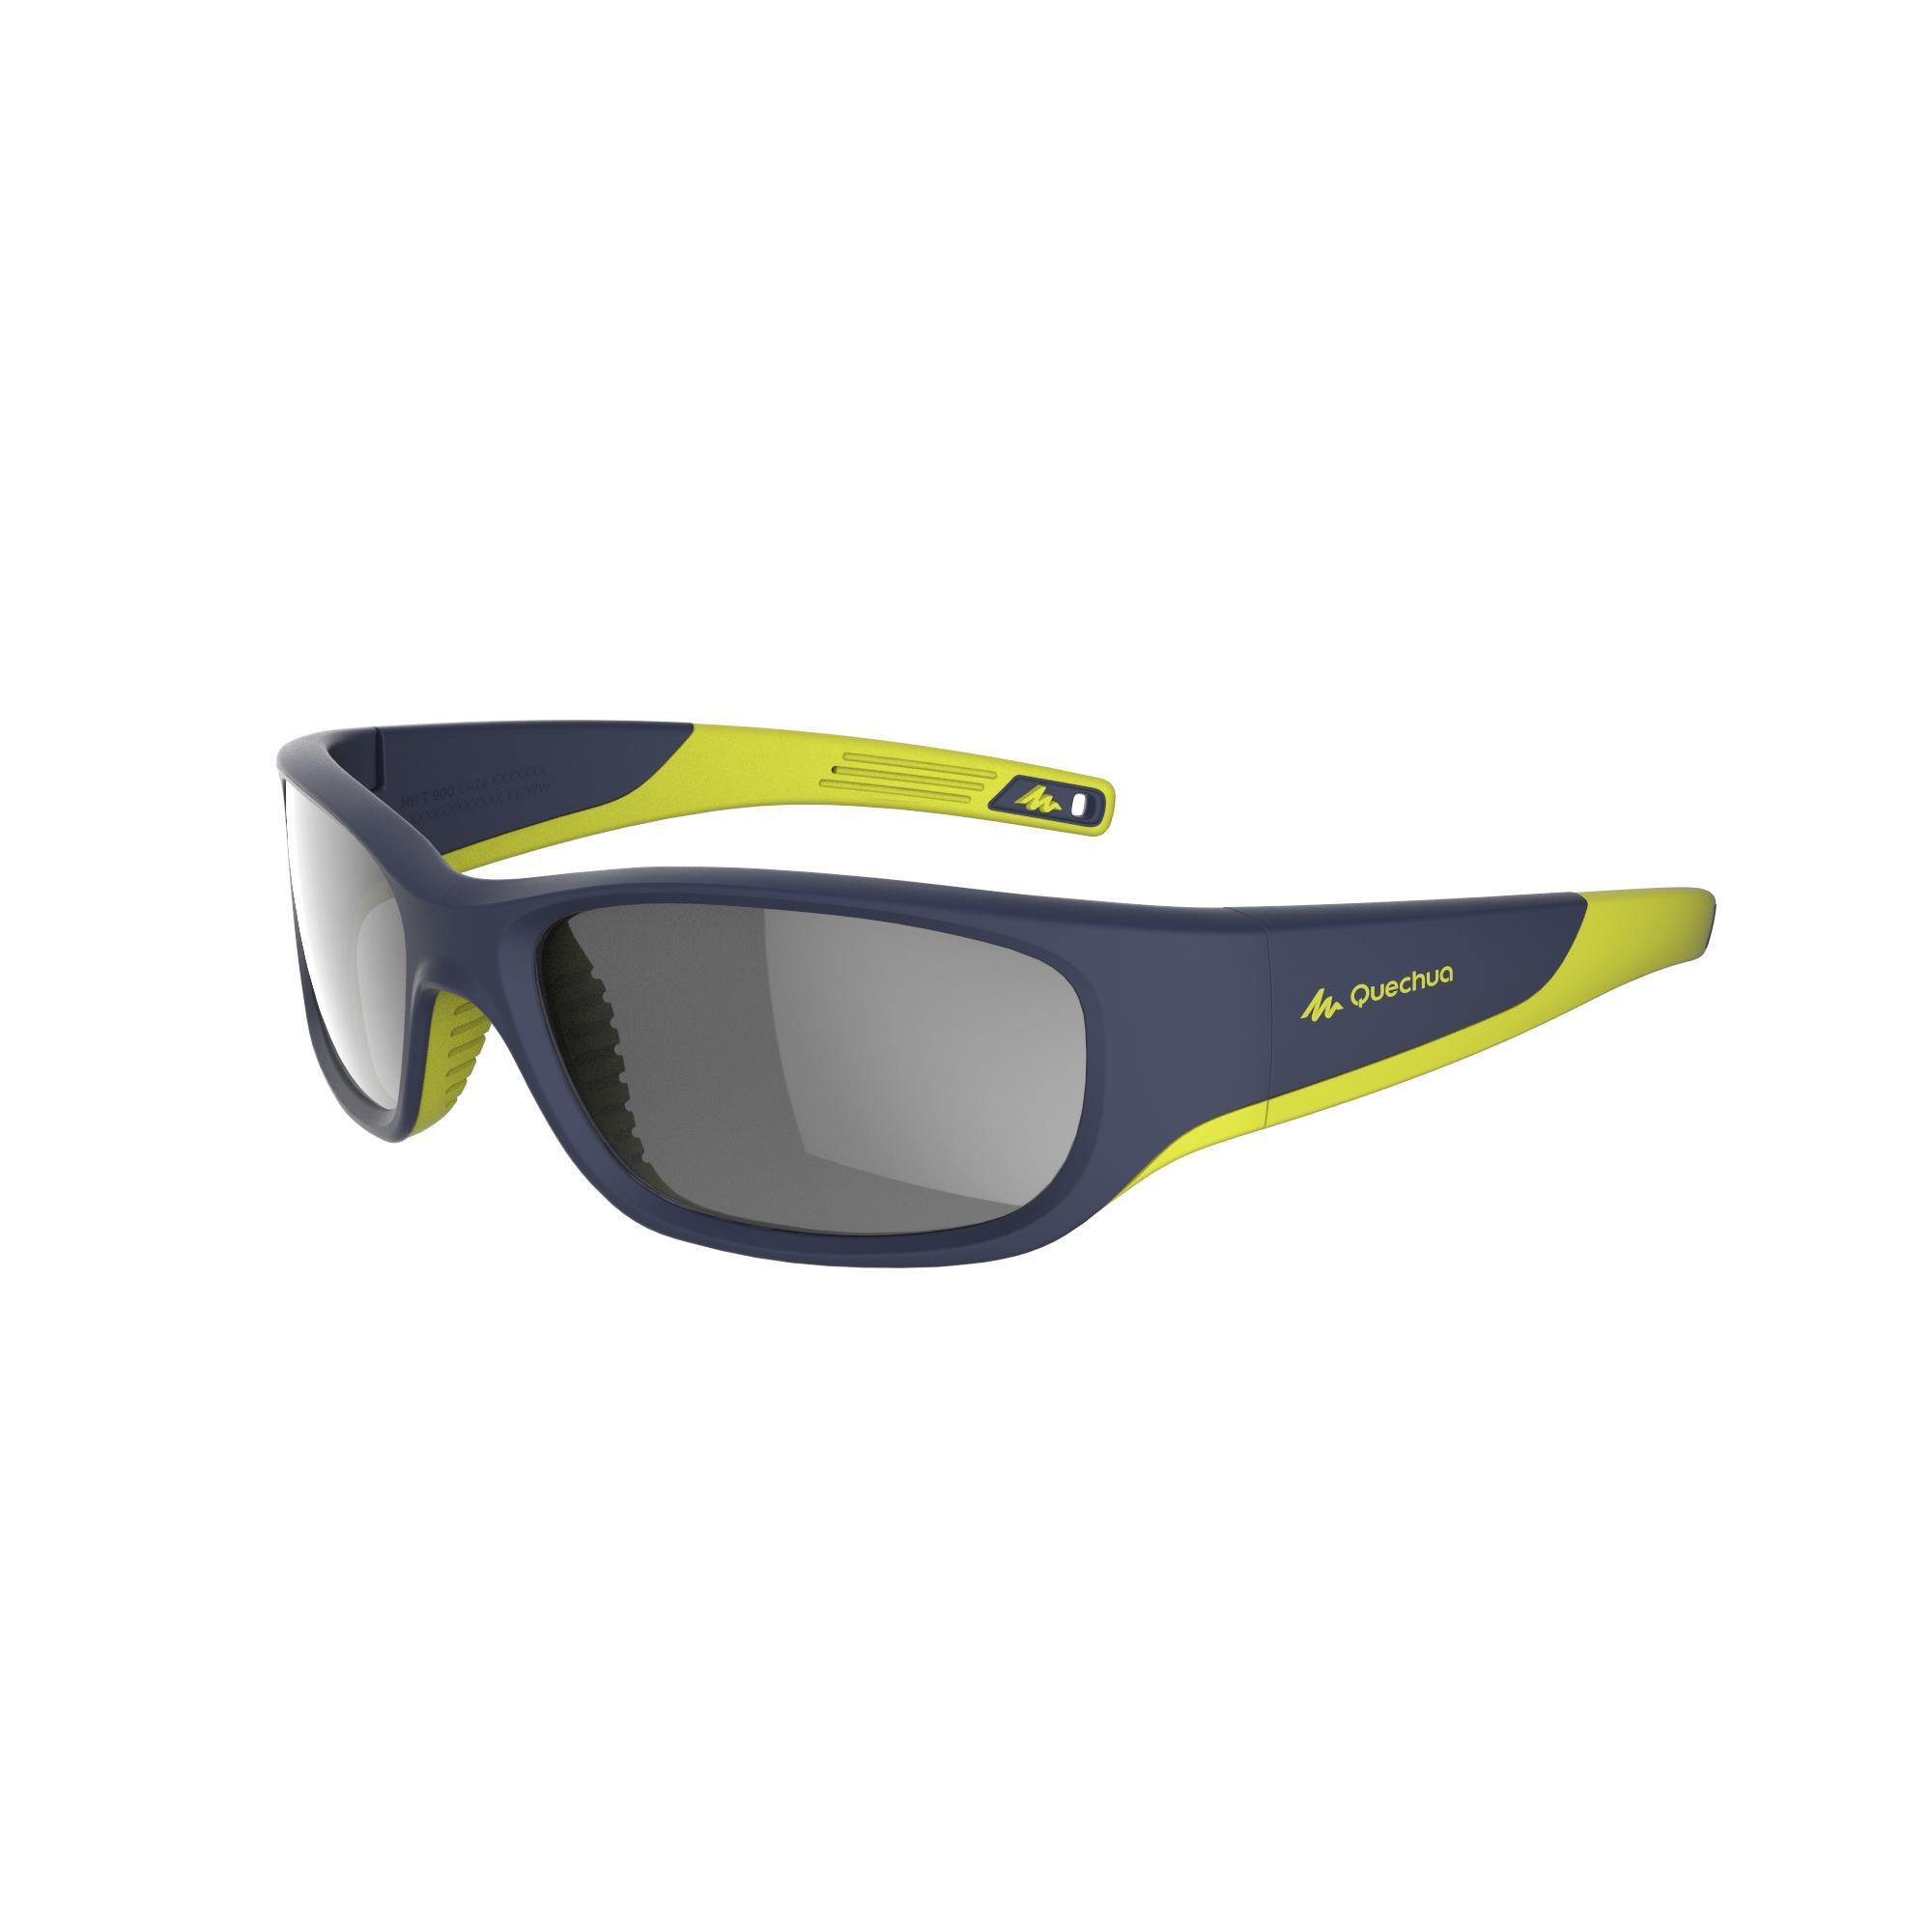 Kid's Hiking Sunglasses MHT550 Category 4 - Blue